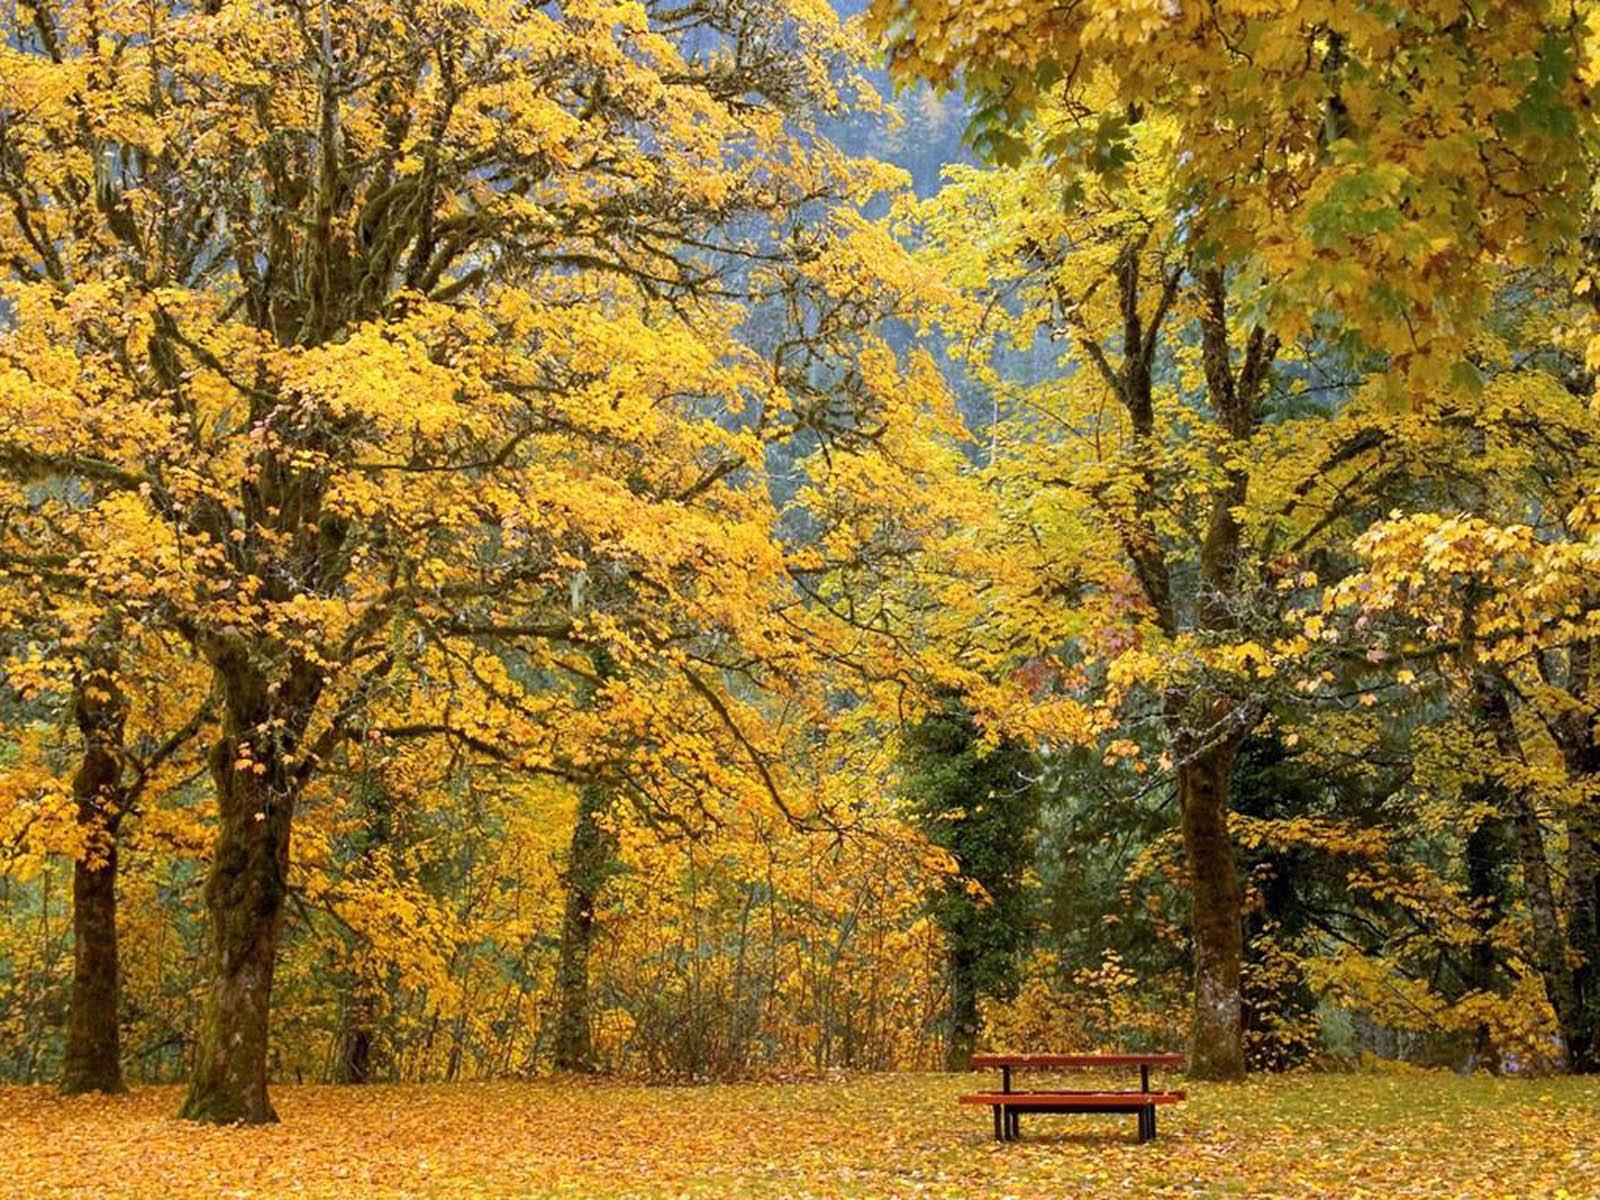 Autumn Scenery Desktop Wallpapers Beautiful Autumn Scenery Desktop 1600x1200